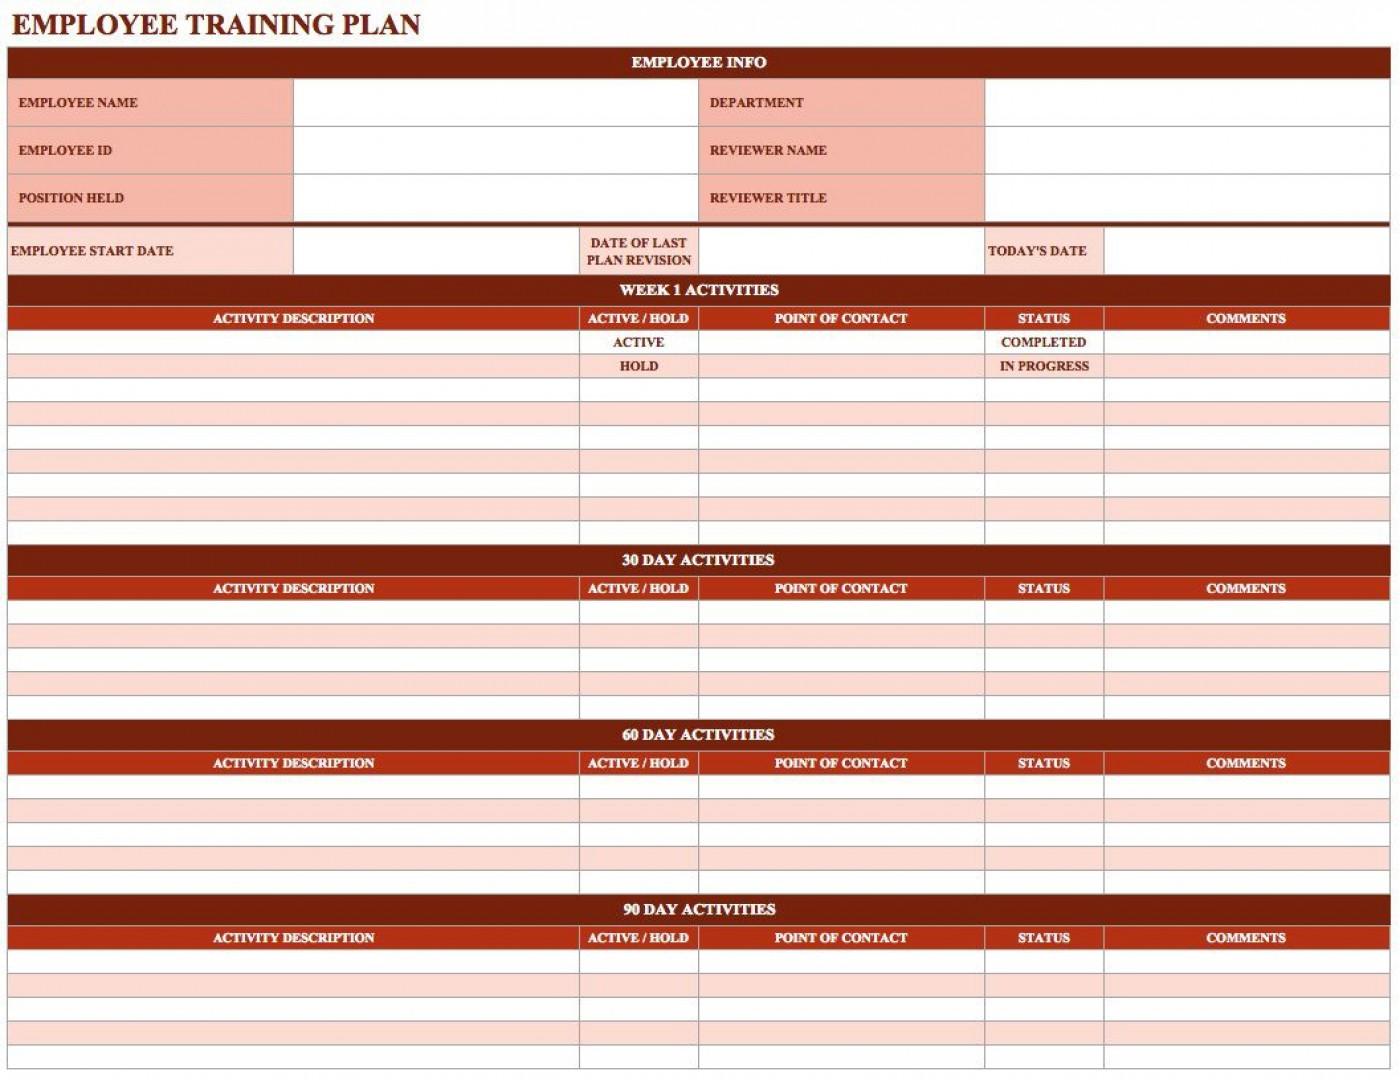 000 Shocking Employee Training Plan Template Highest Clarity  Word Excel Download Staff Program1400